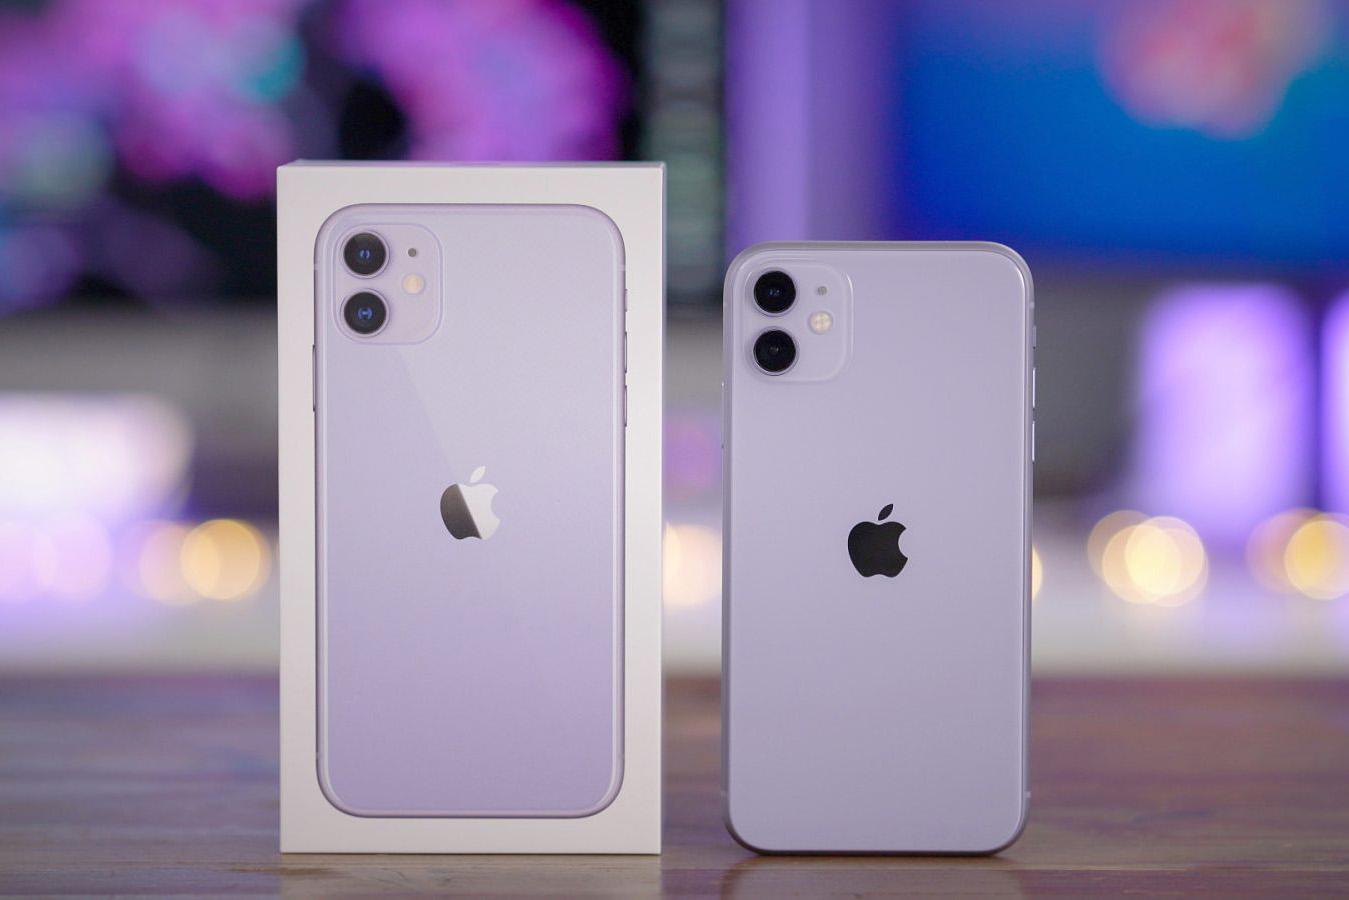 apples-iphone-11-captures-68-of-indias